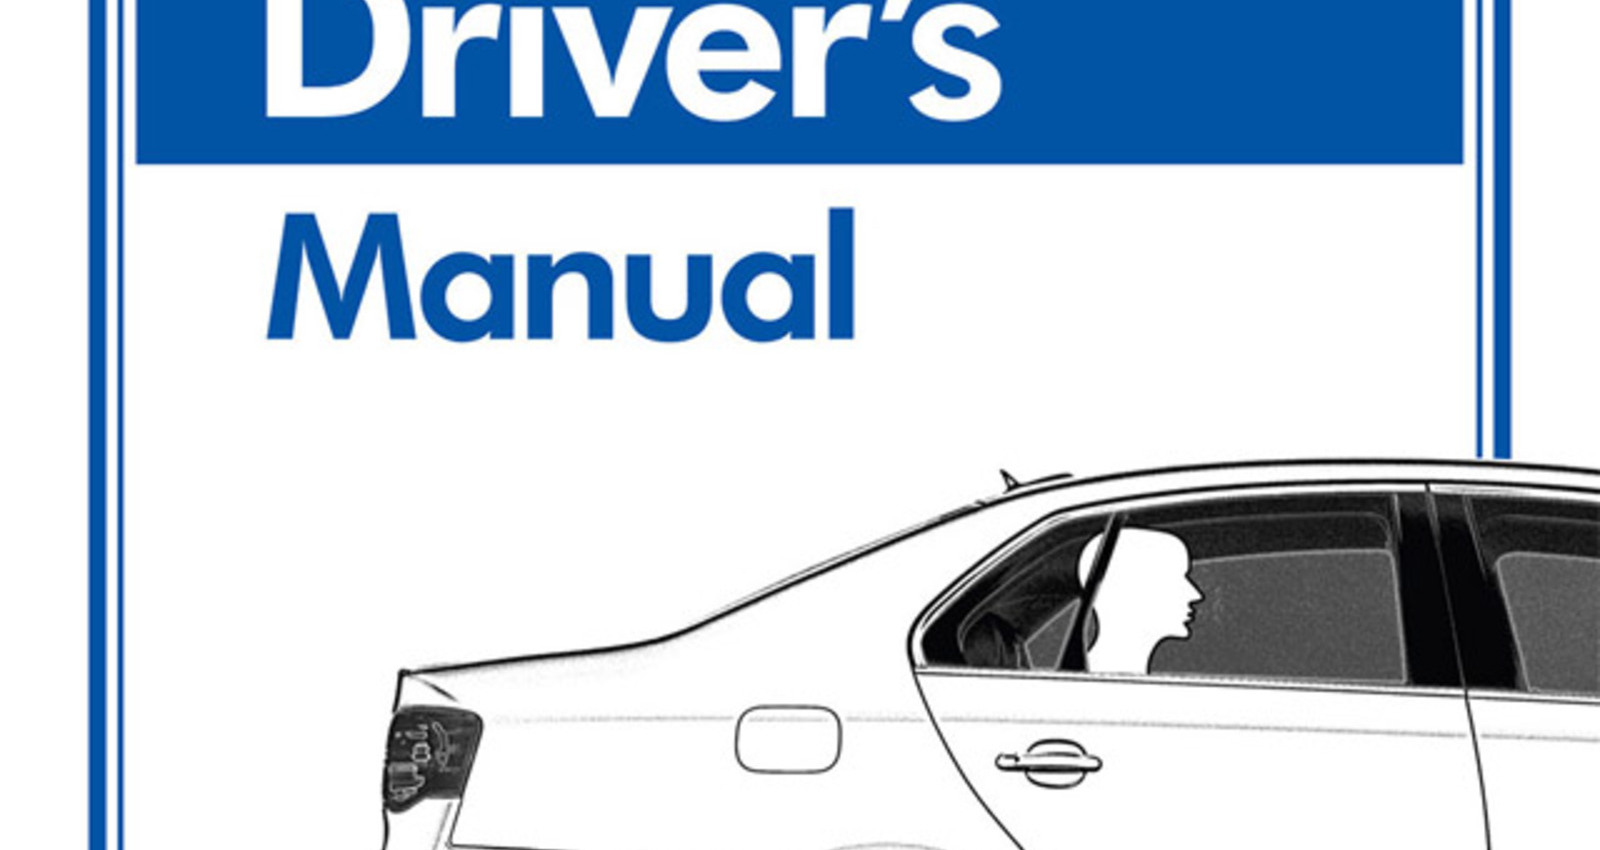 Backseat Driver's Manual